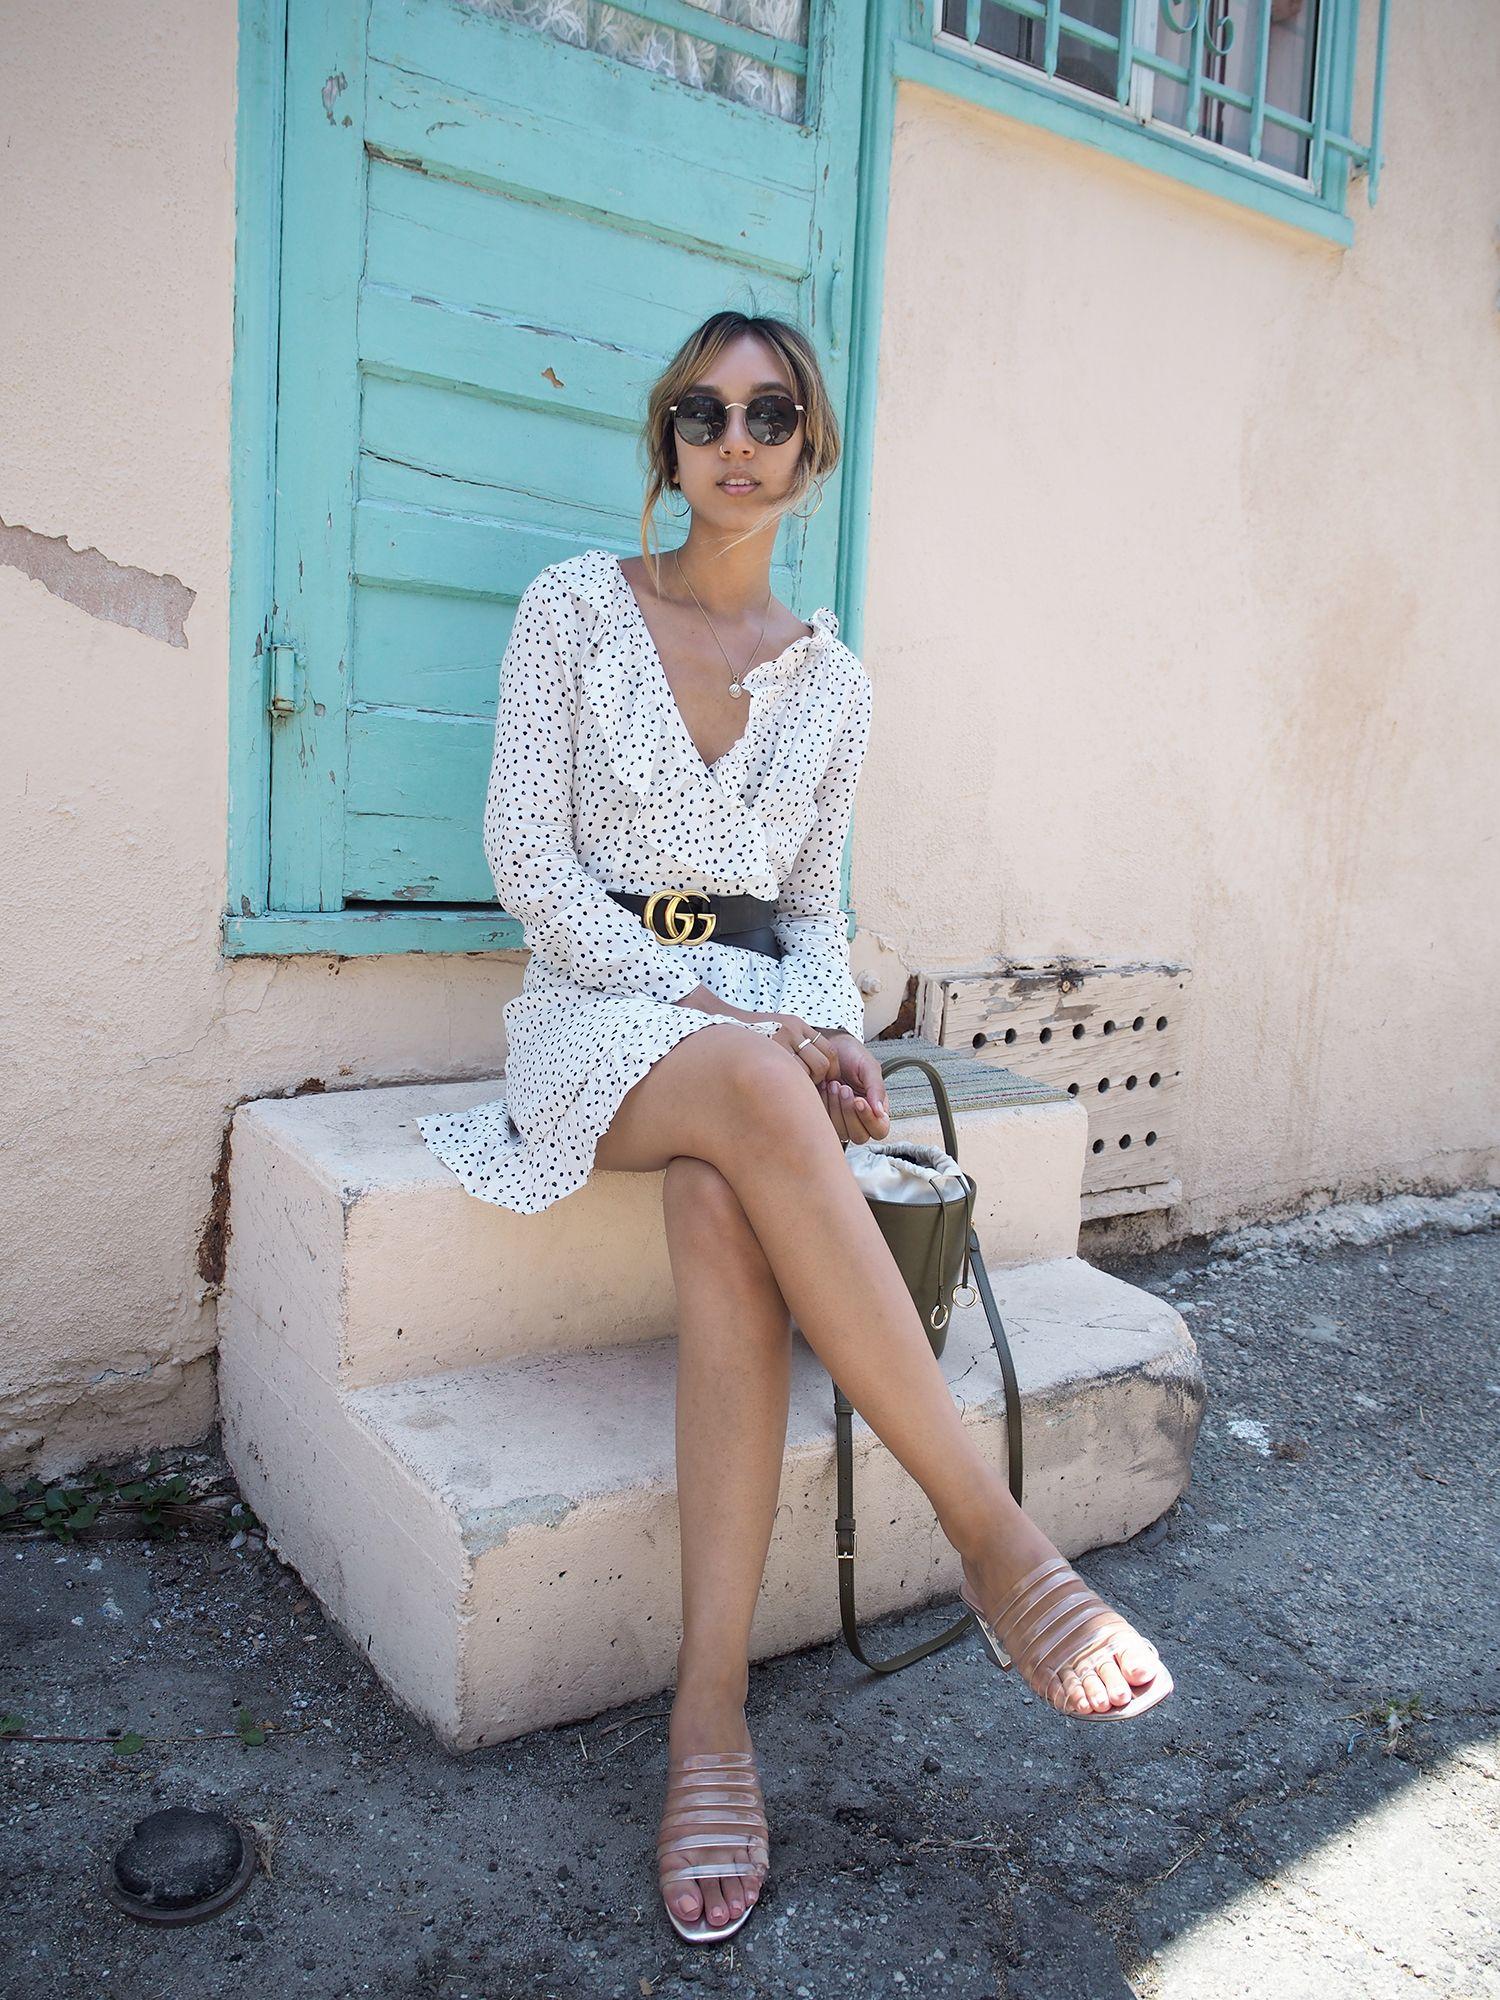 612ef18c83 Unconscious Style - Verge Girl Polka Dot Ruffle Dress | Unconscious ...